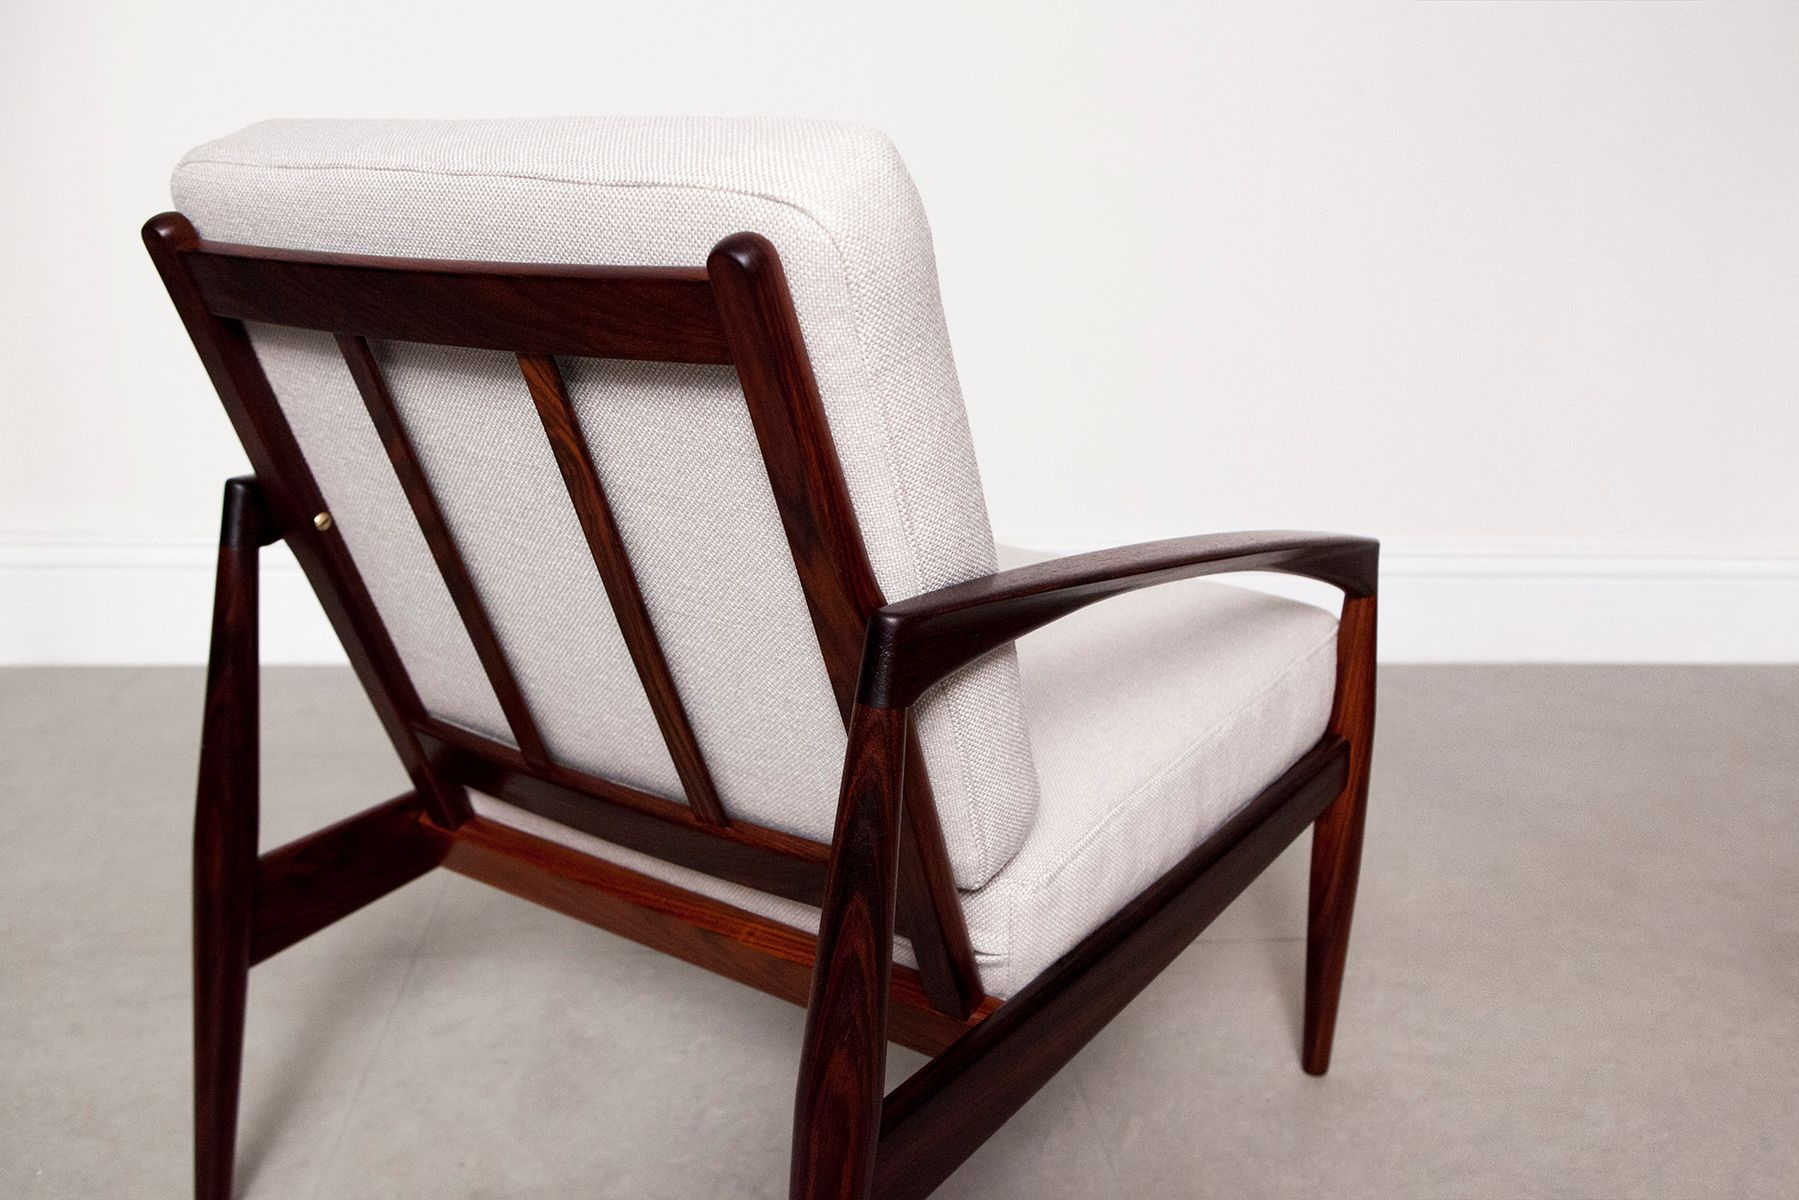 Rosewood paper knife chair by kai kristiansen for magnus olesen 1960s for sale at pamono - Kai kristiansen chair ...